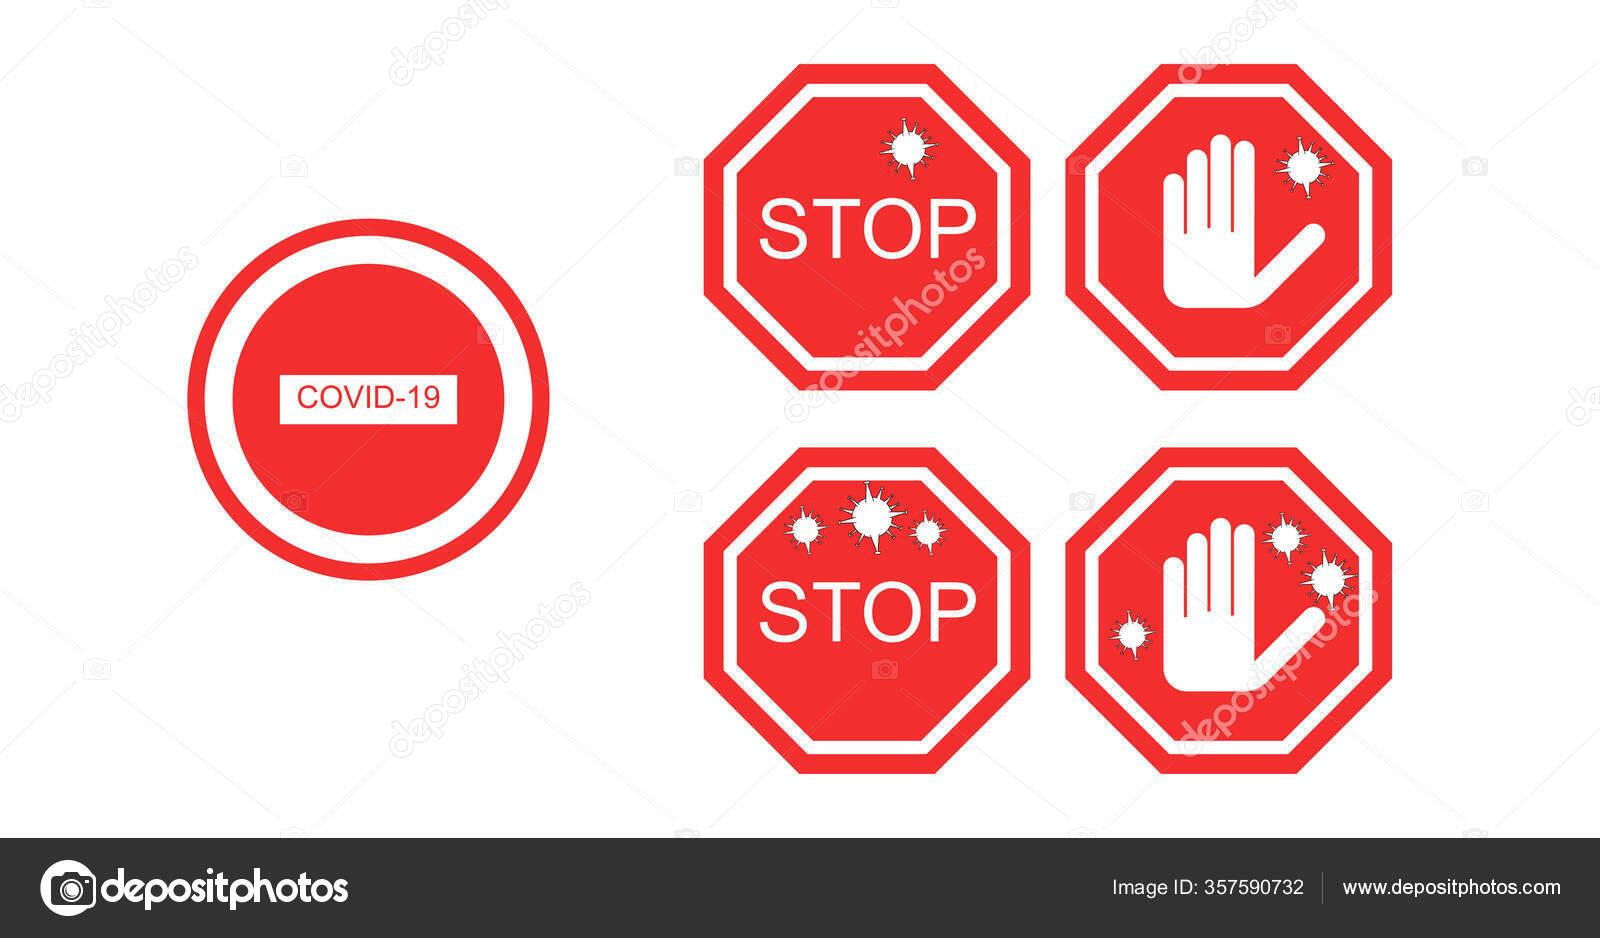 Anzeichen An Coronavirus